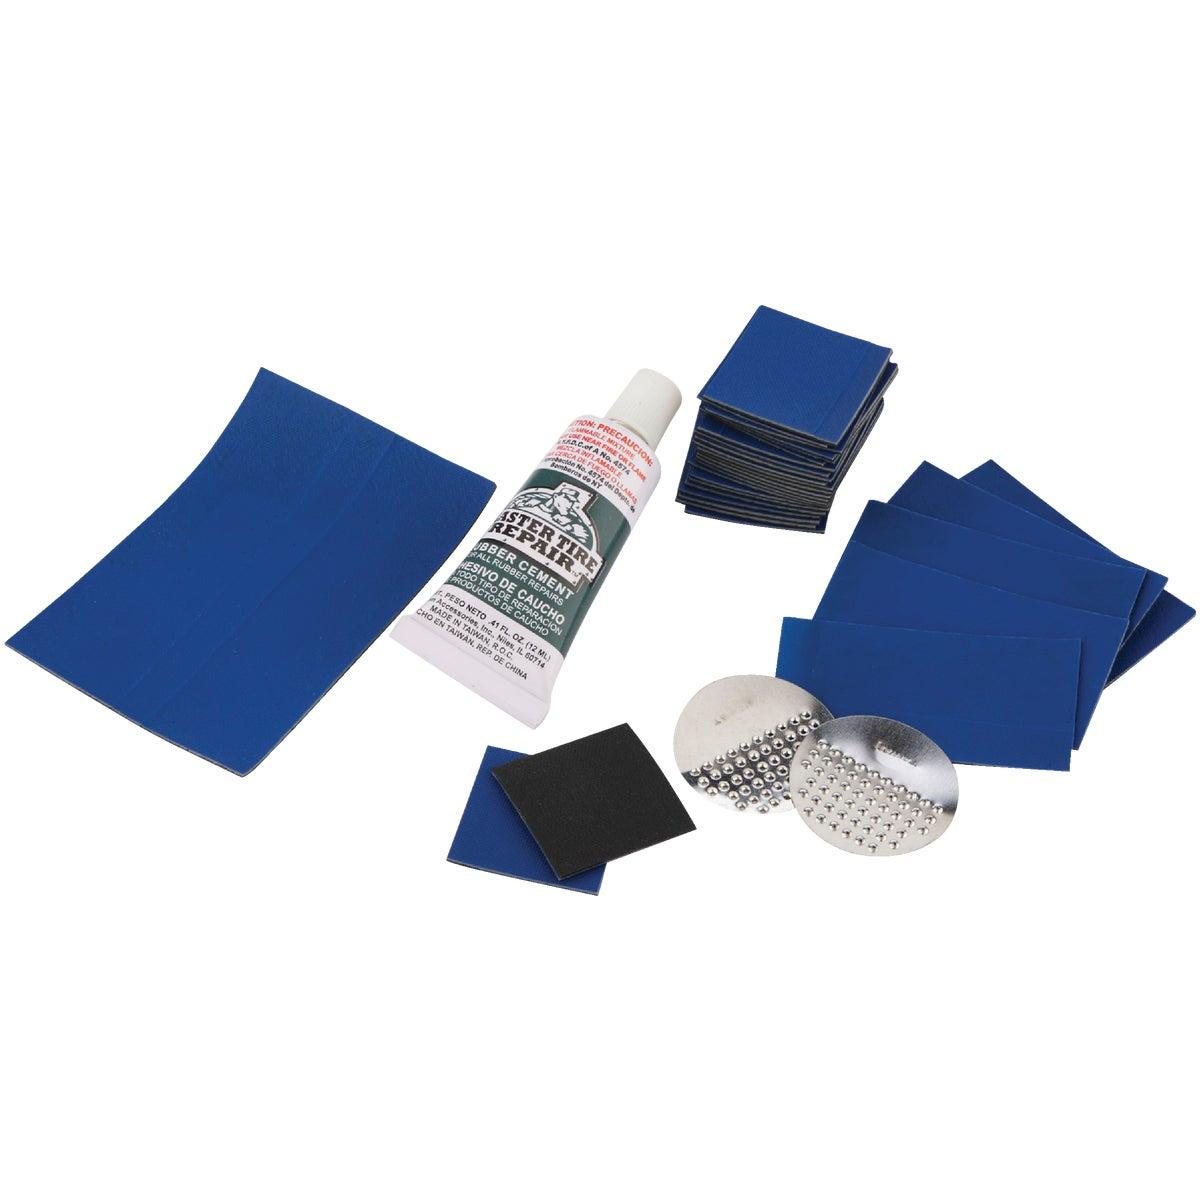 Rubber Patch Kit